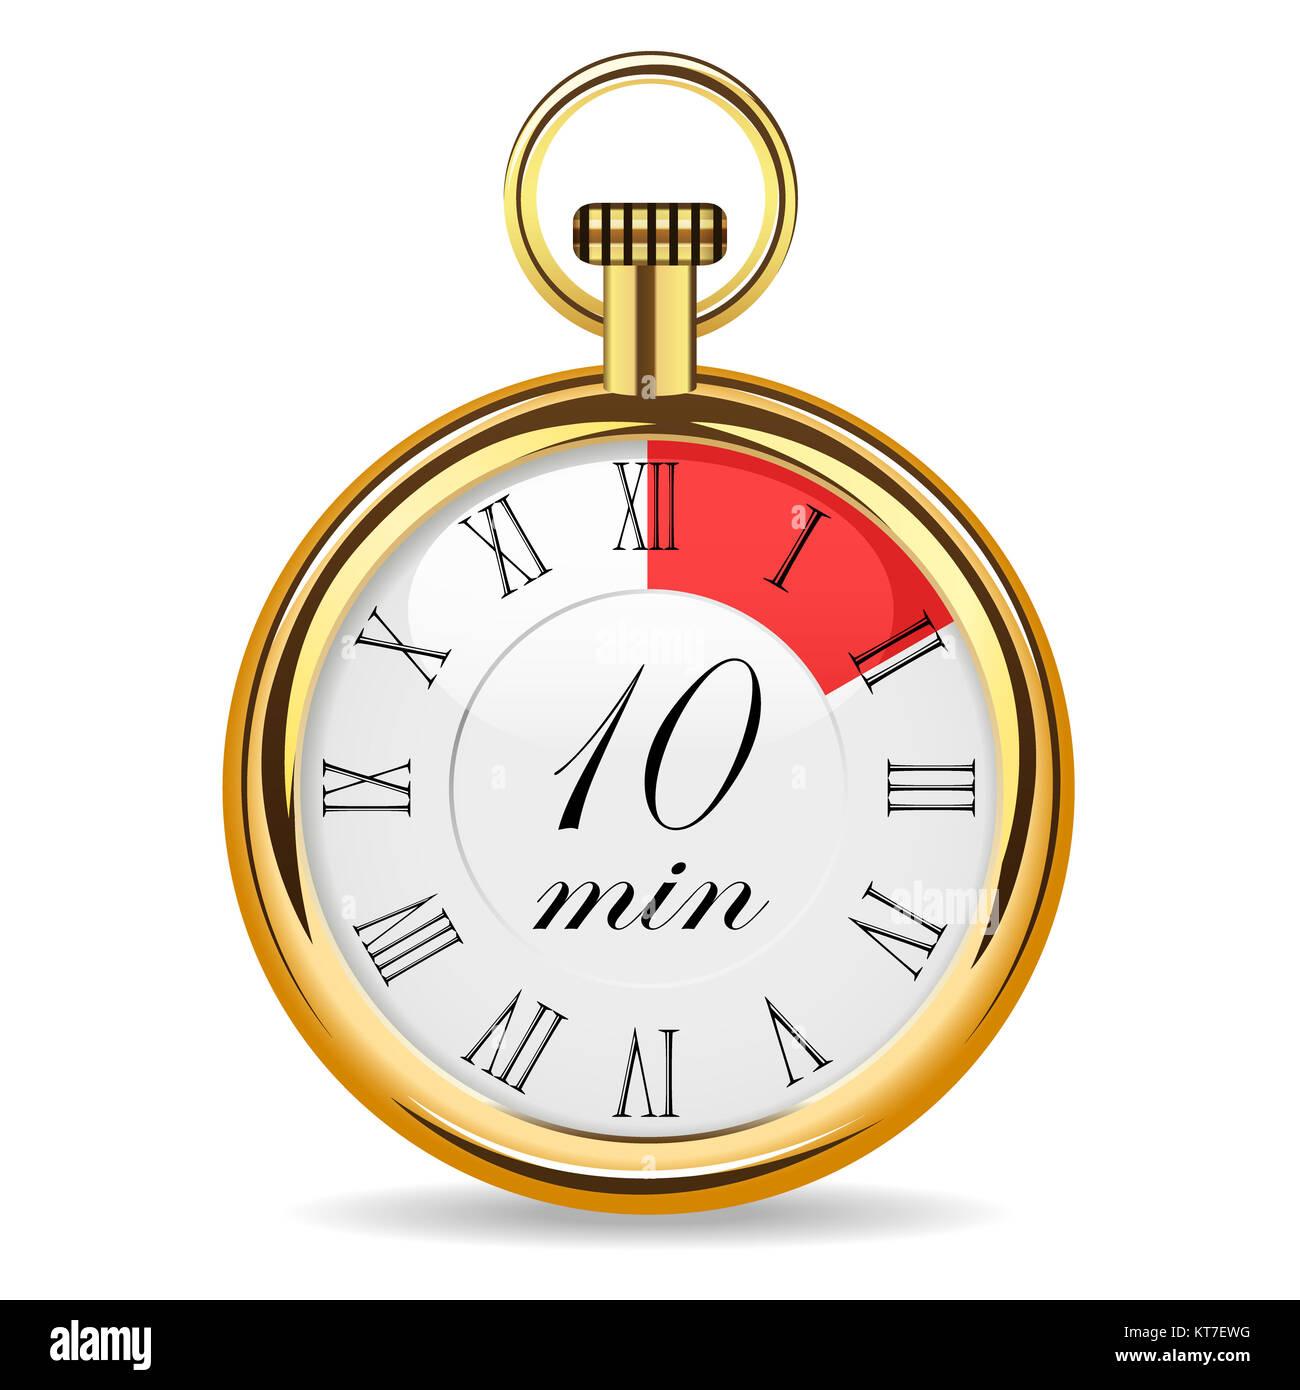 mechanical watch timer 10 minutes